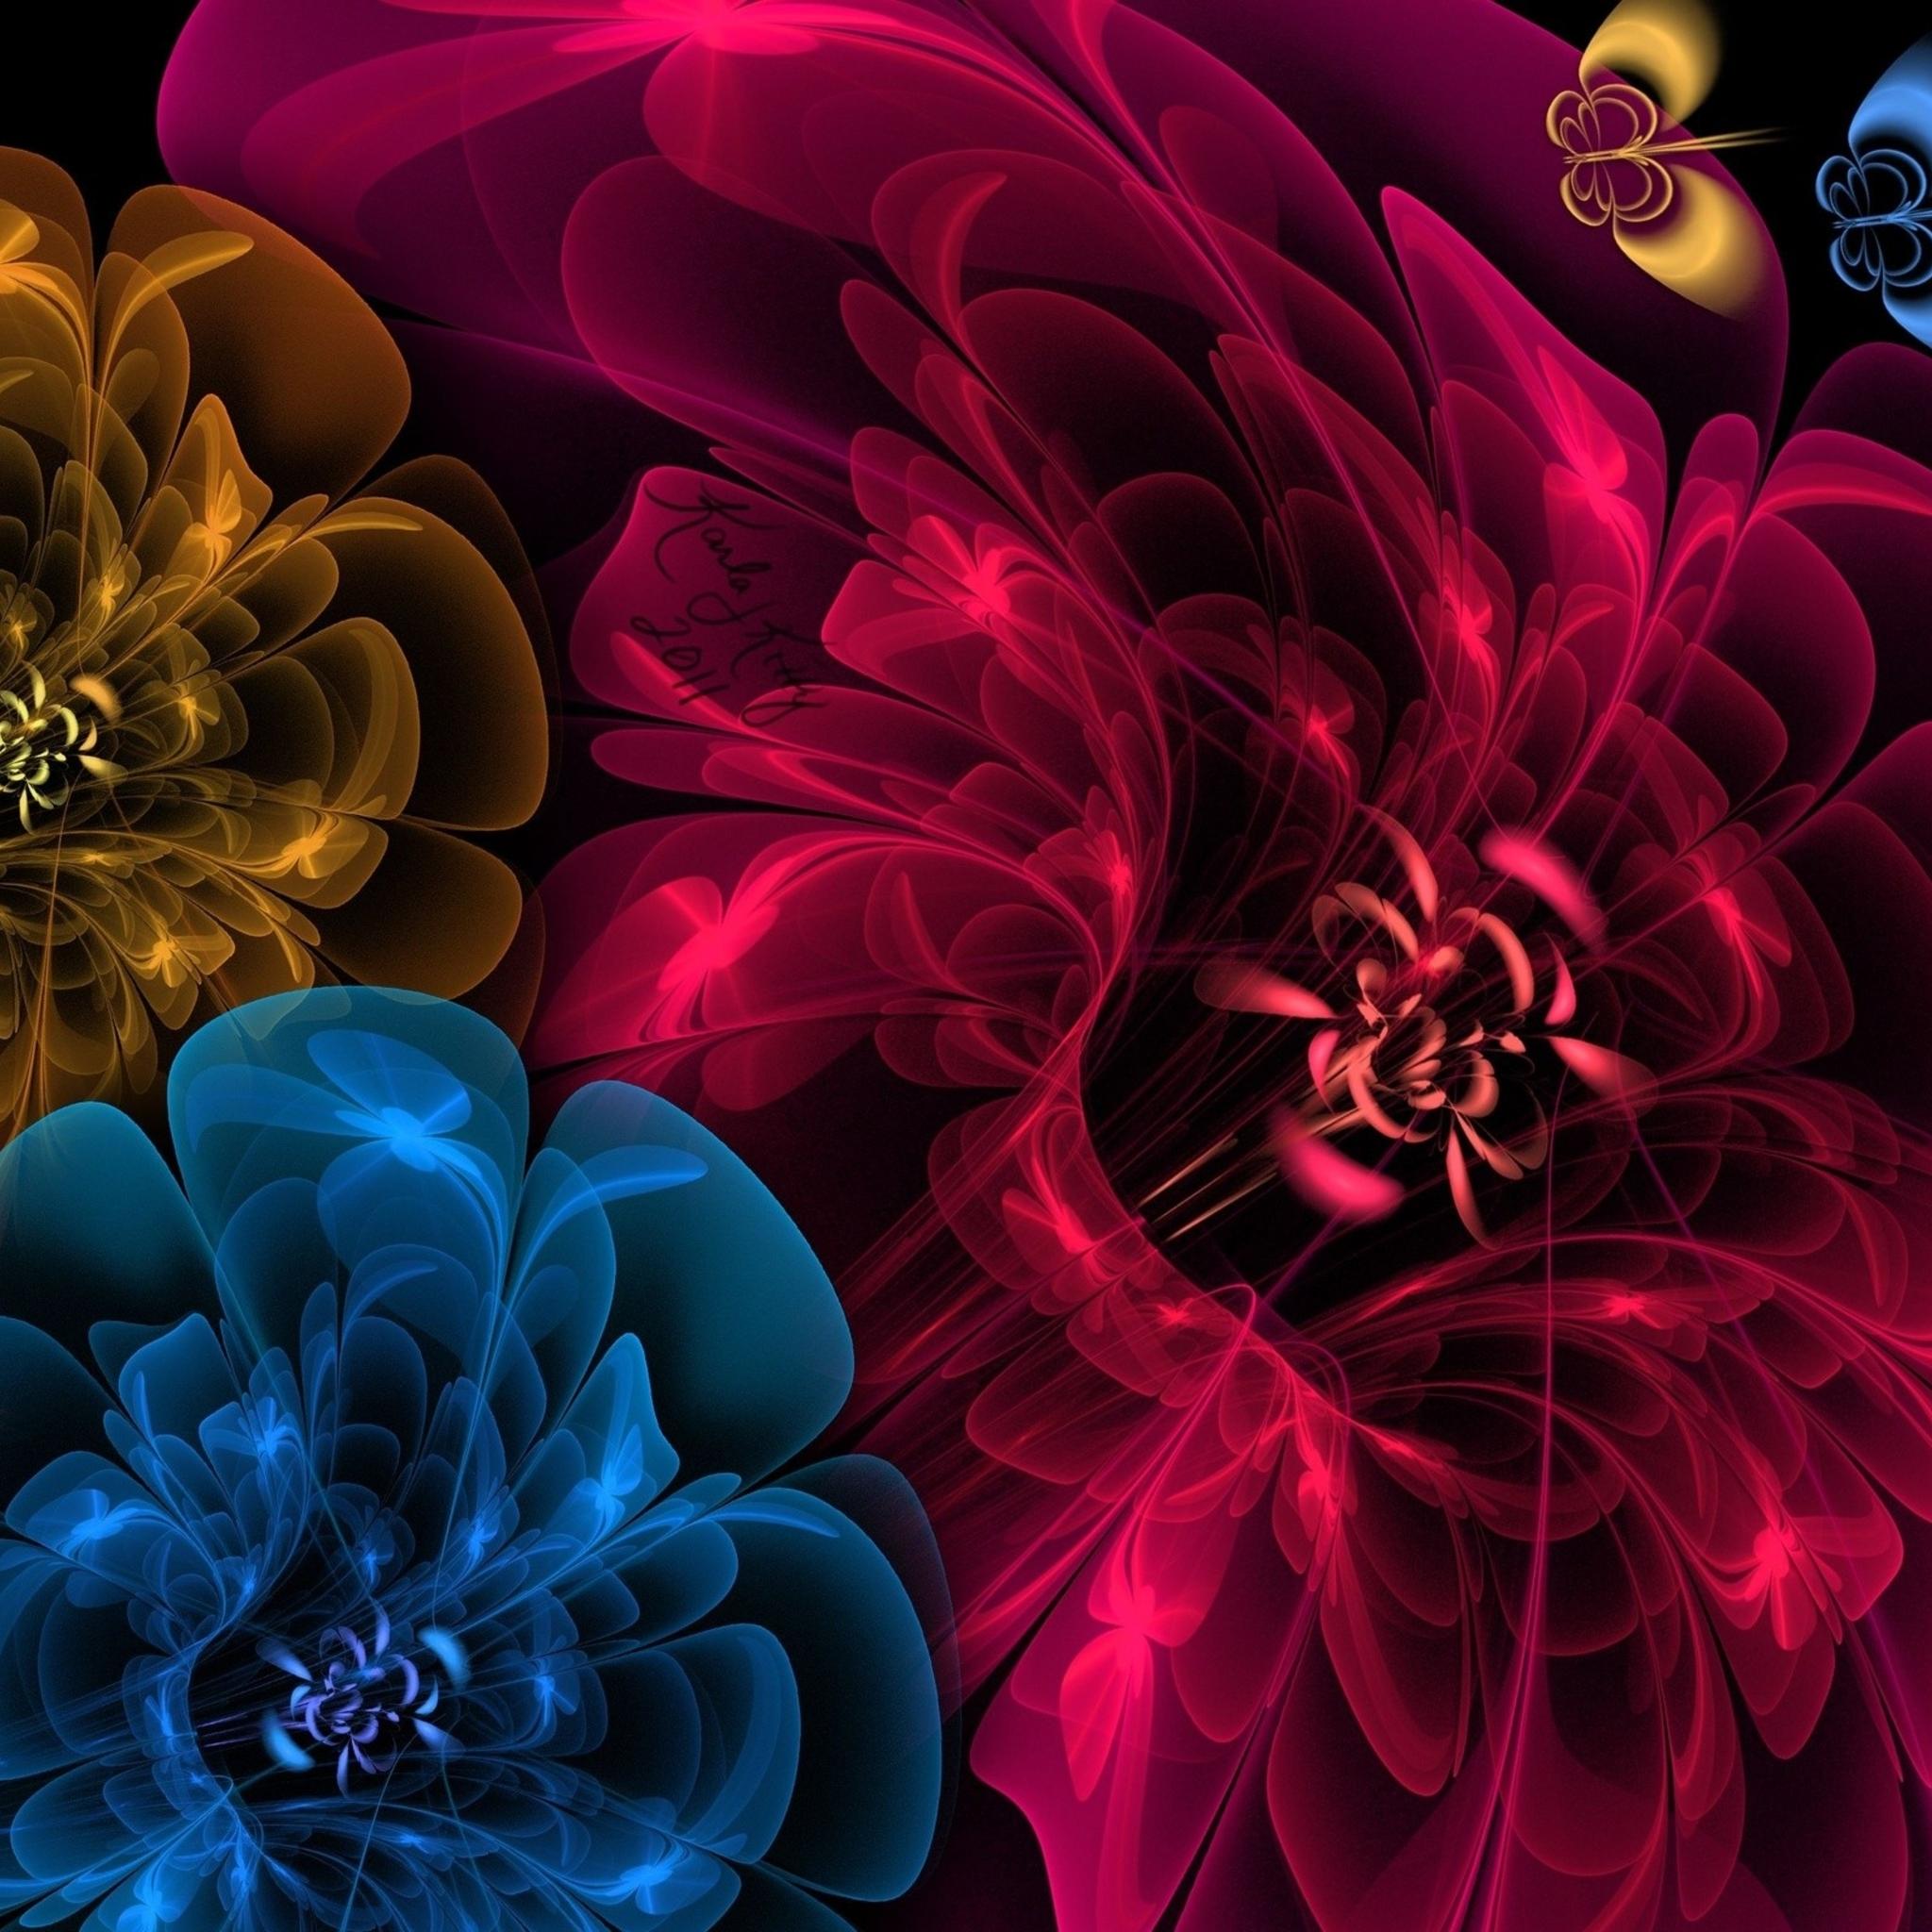 flowers-veil-new.jpg